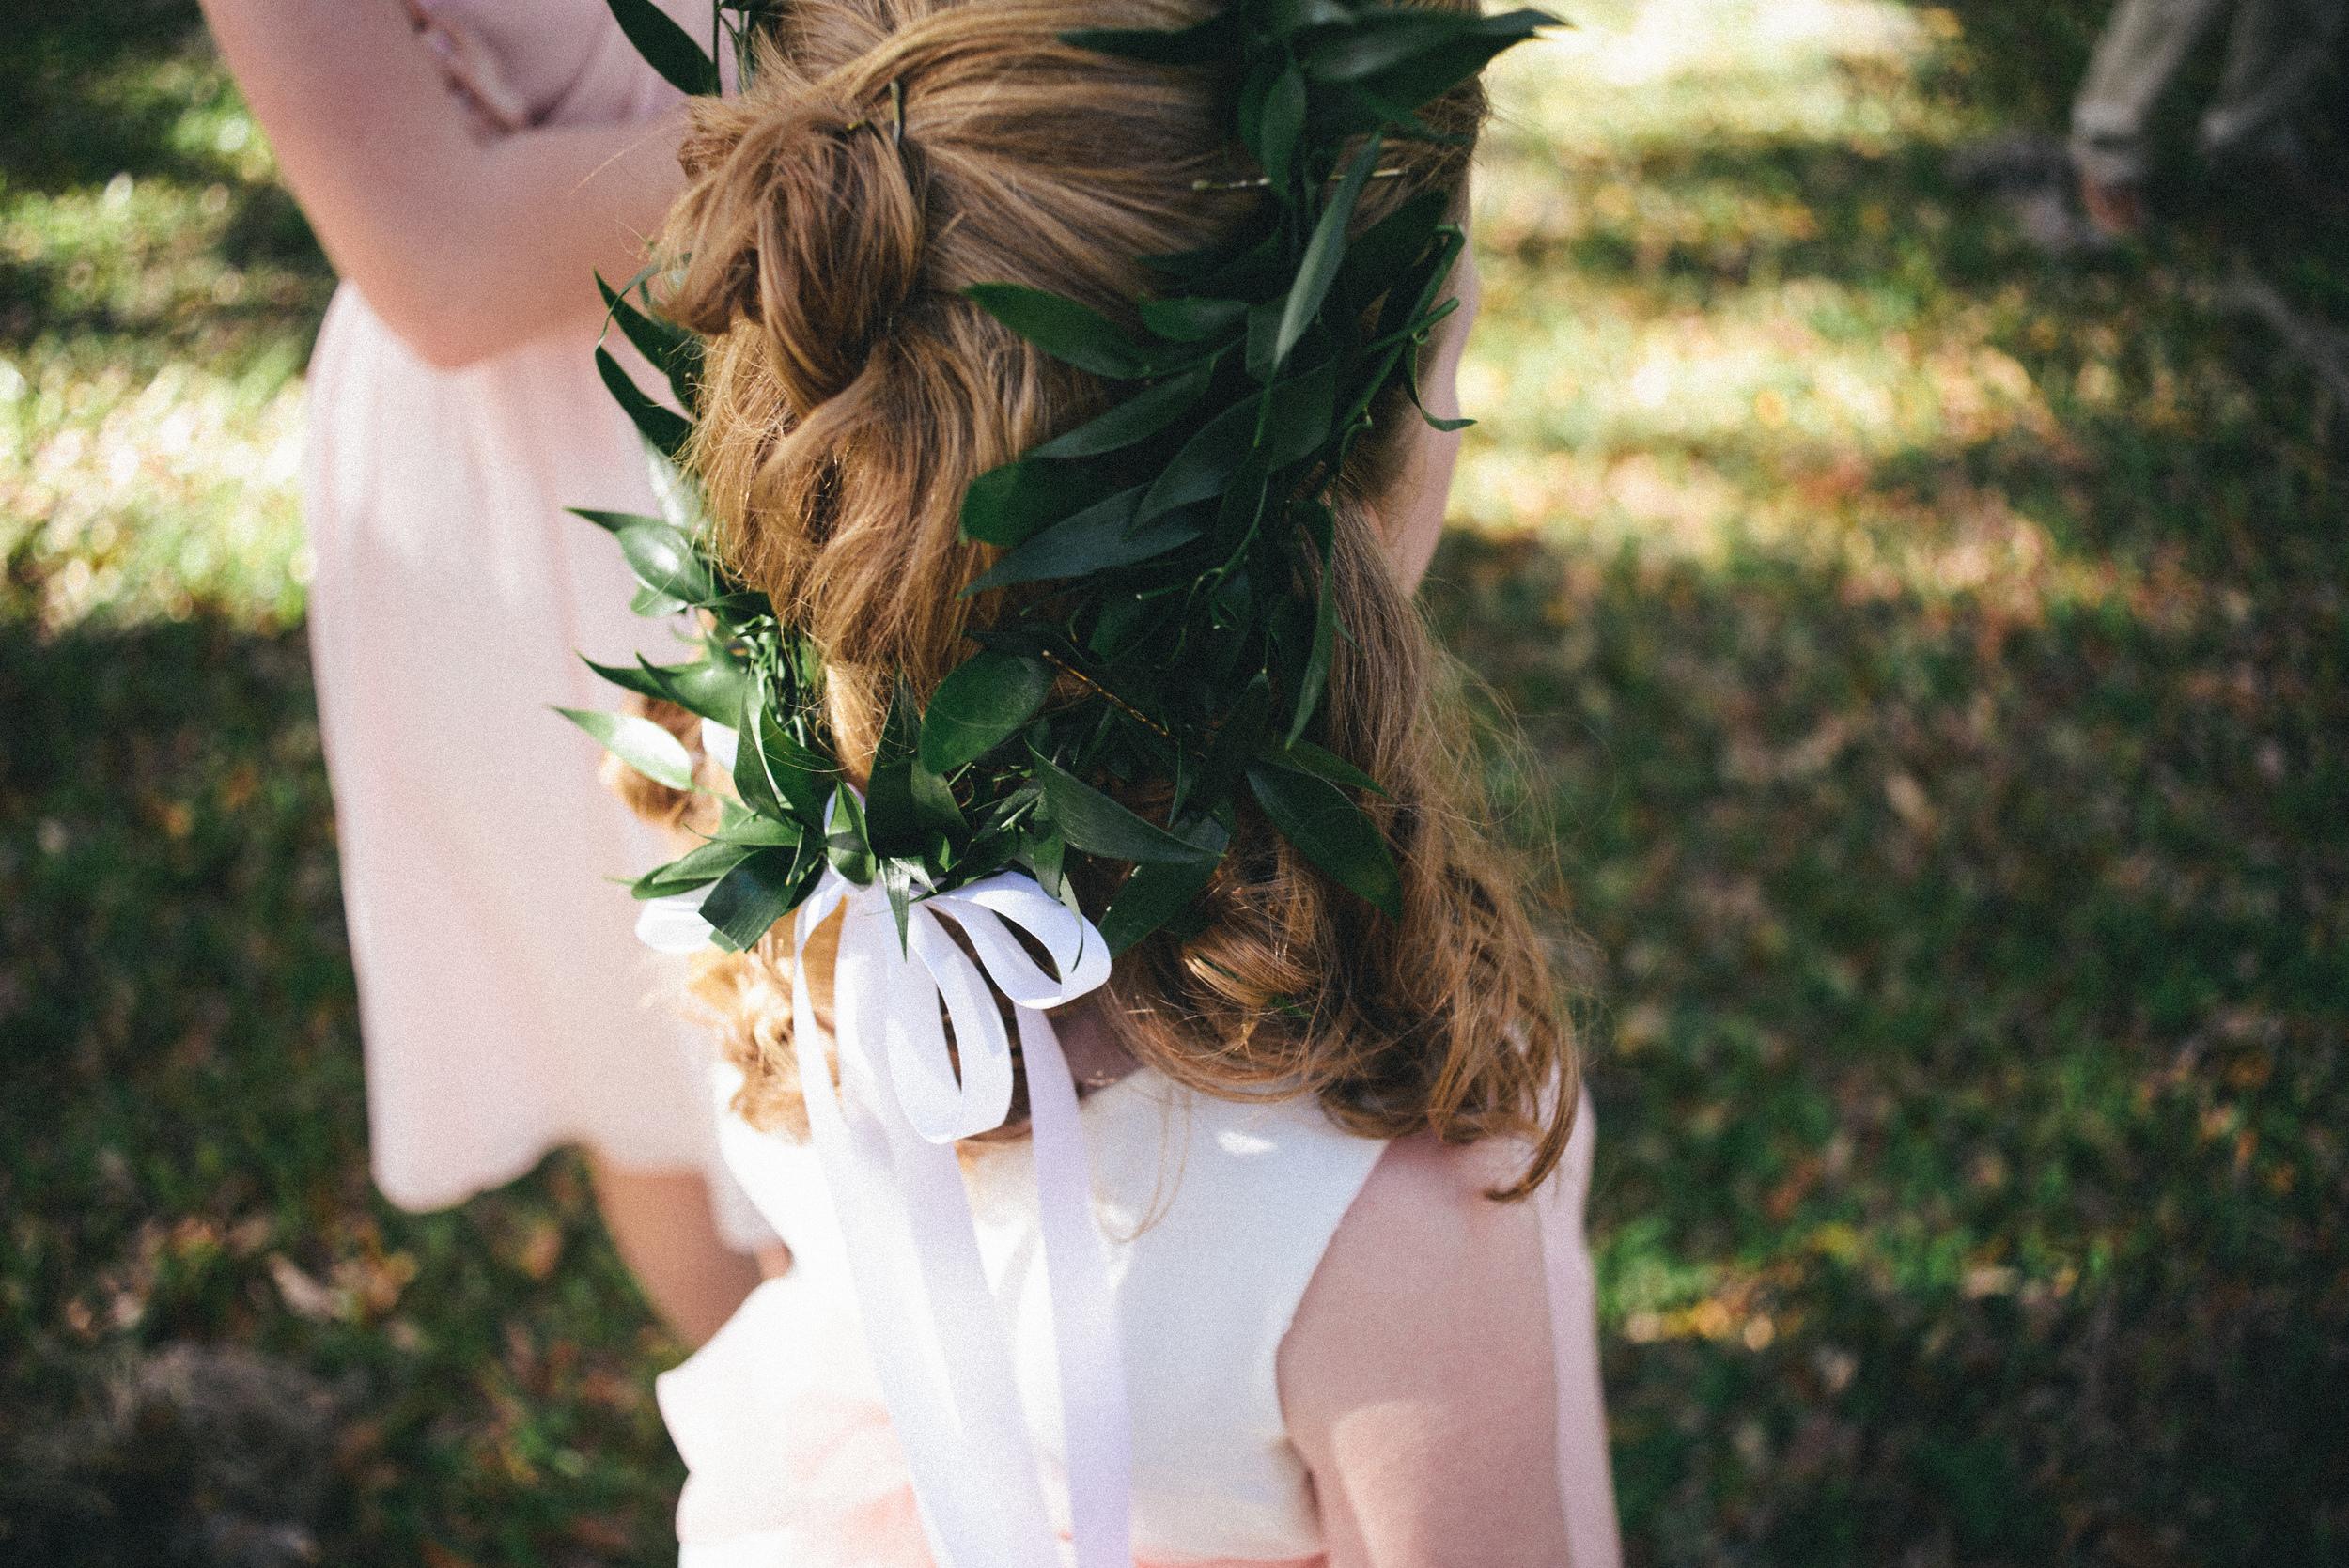 kadi-and-matt-carroll-april-9-2016-jekyl-island-wedding-m-newsom-photography- (361 of 744).jpg